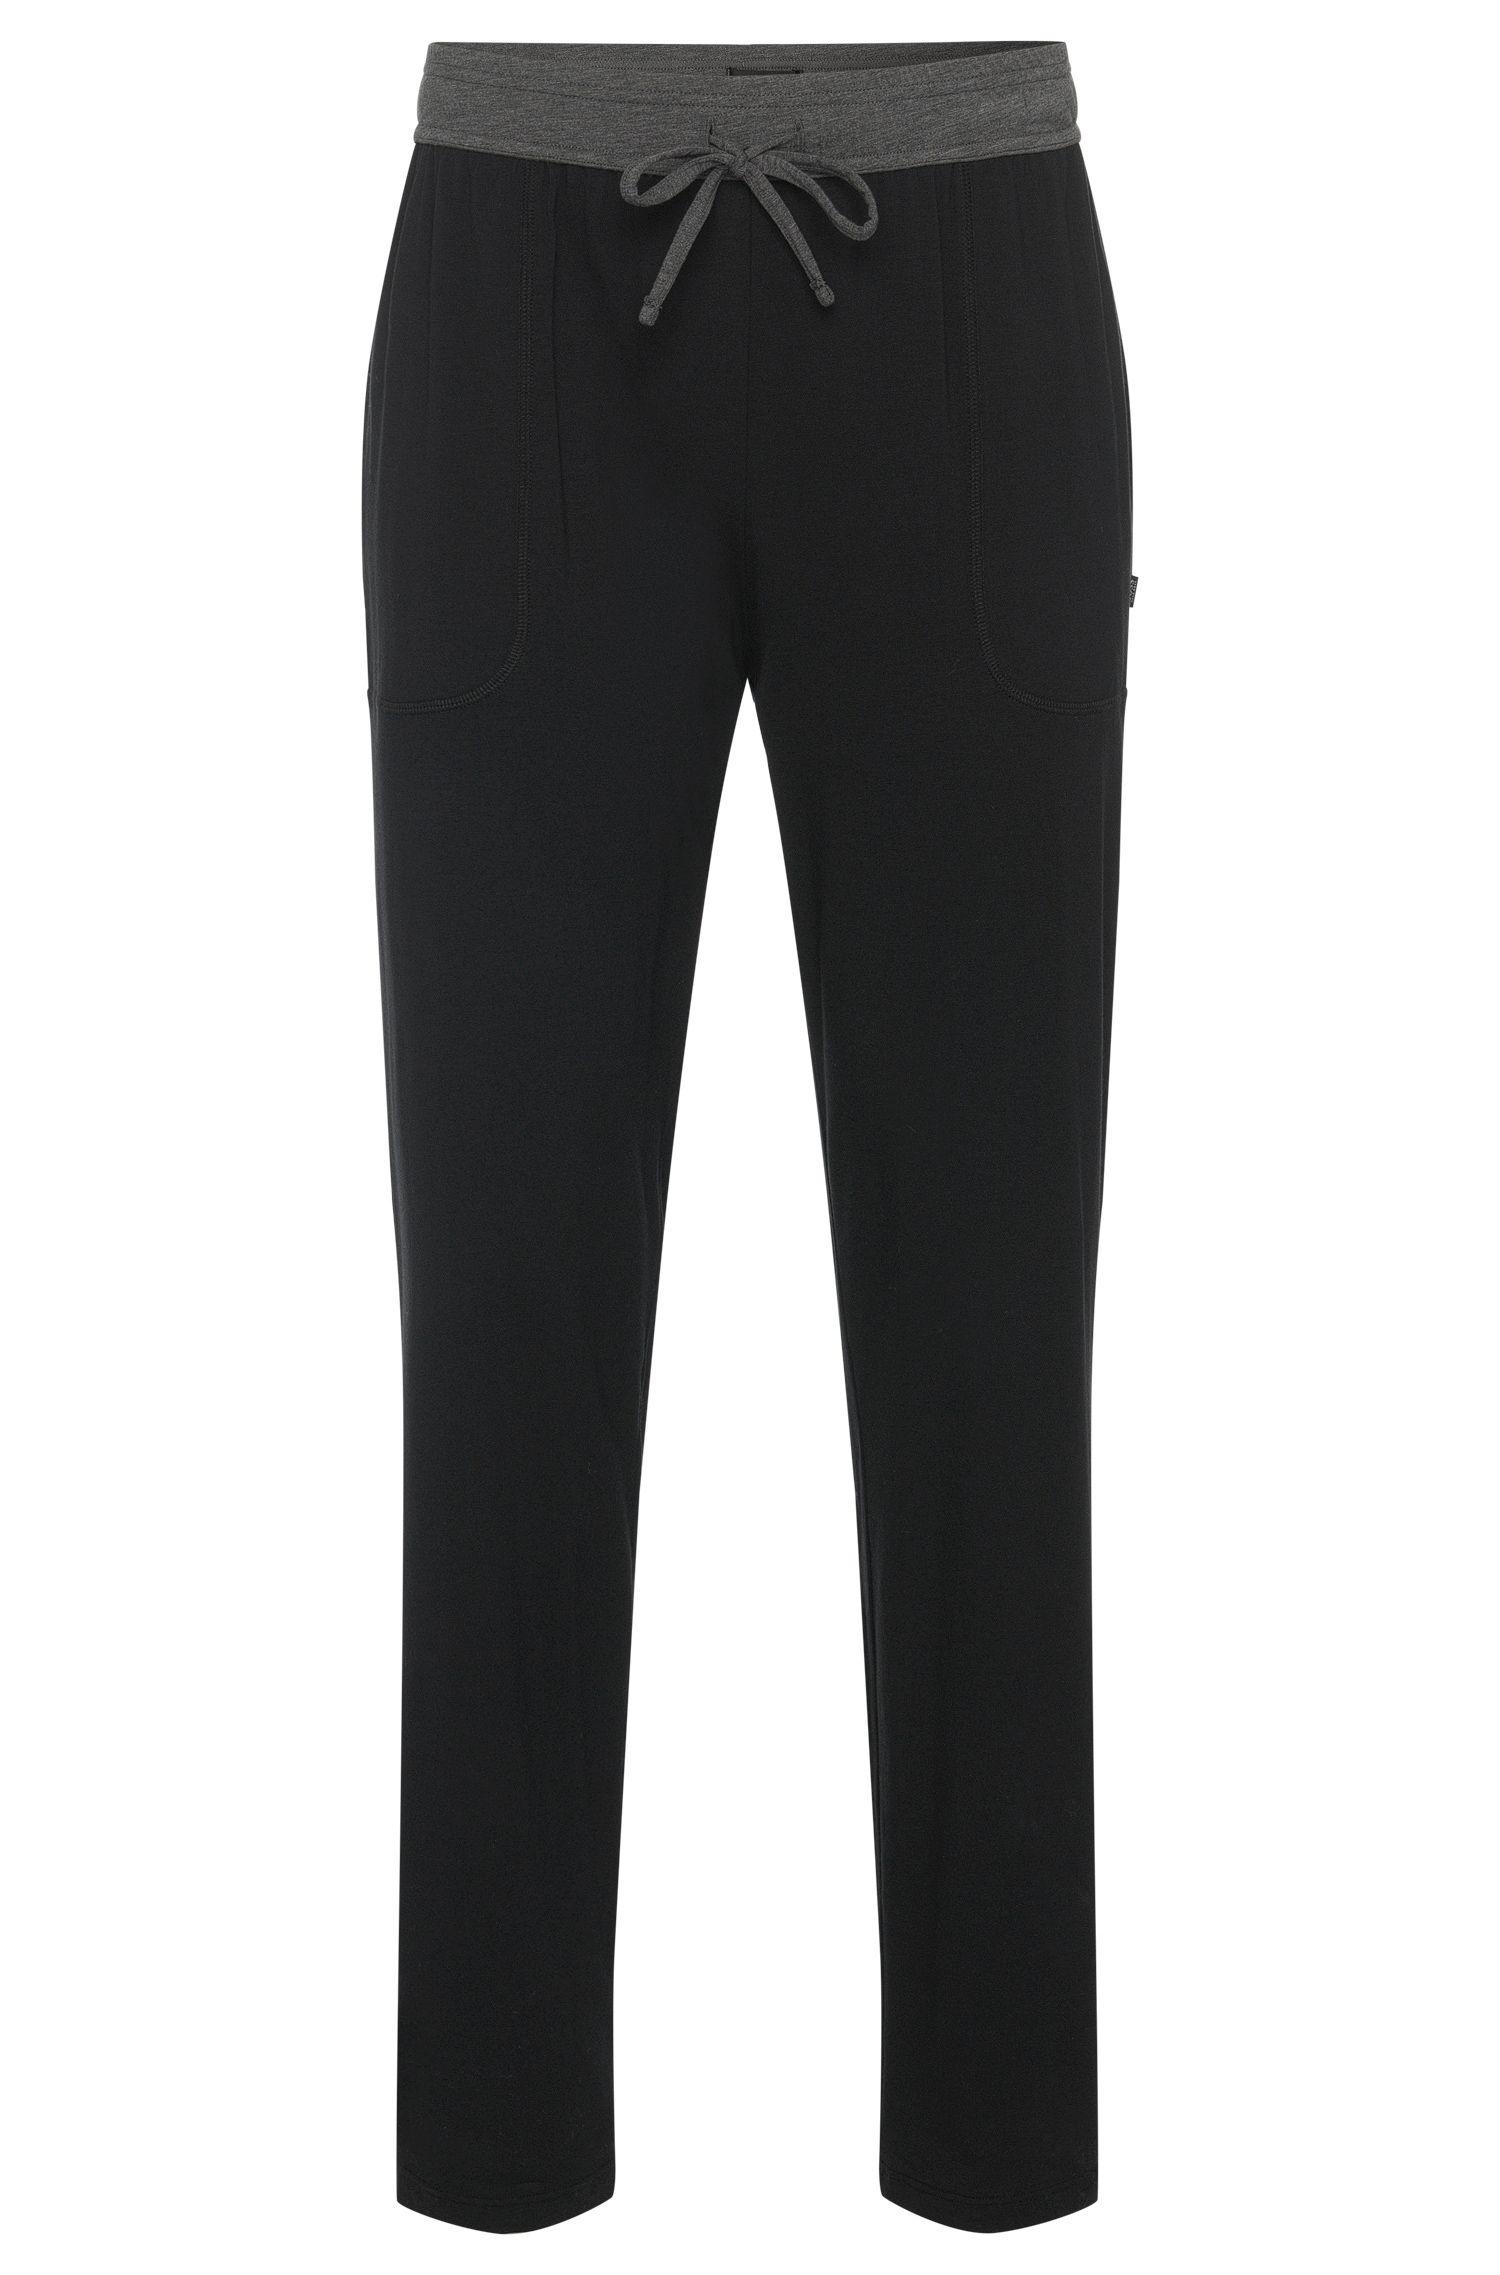 Pyjama-Hose aus Baumwoll-Mix mit kontrastfarbenem Bund: 'Long Pant CW'